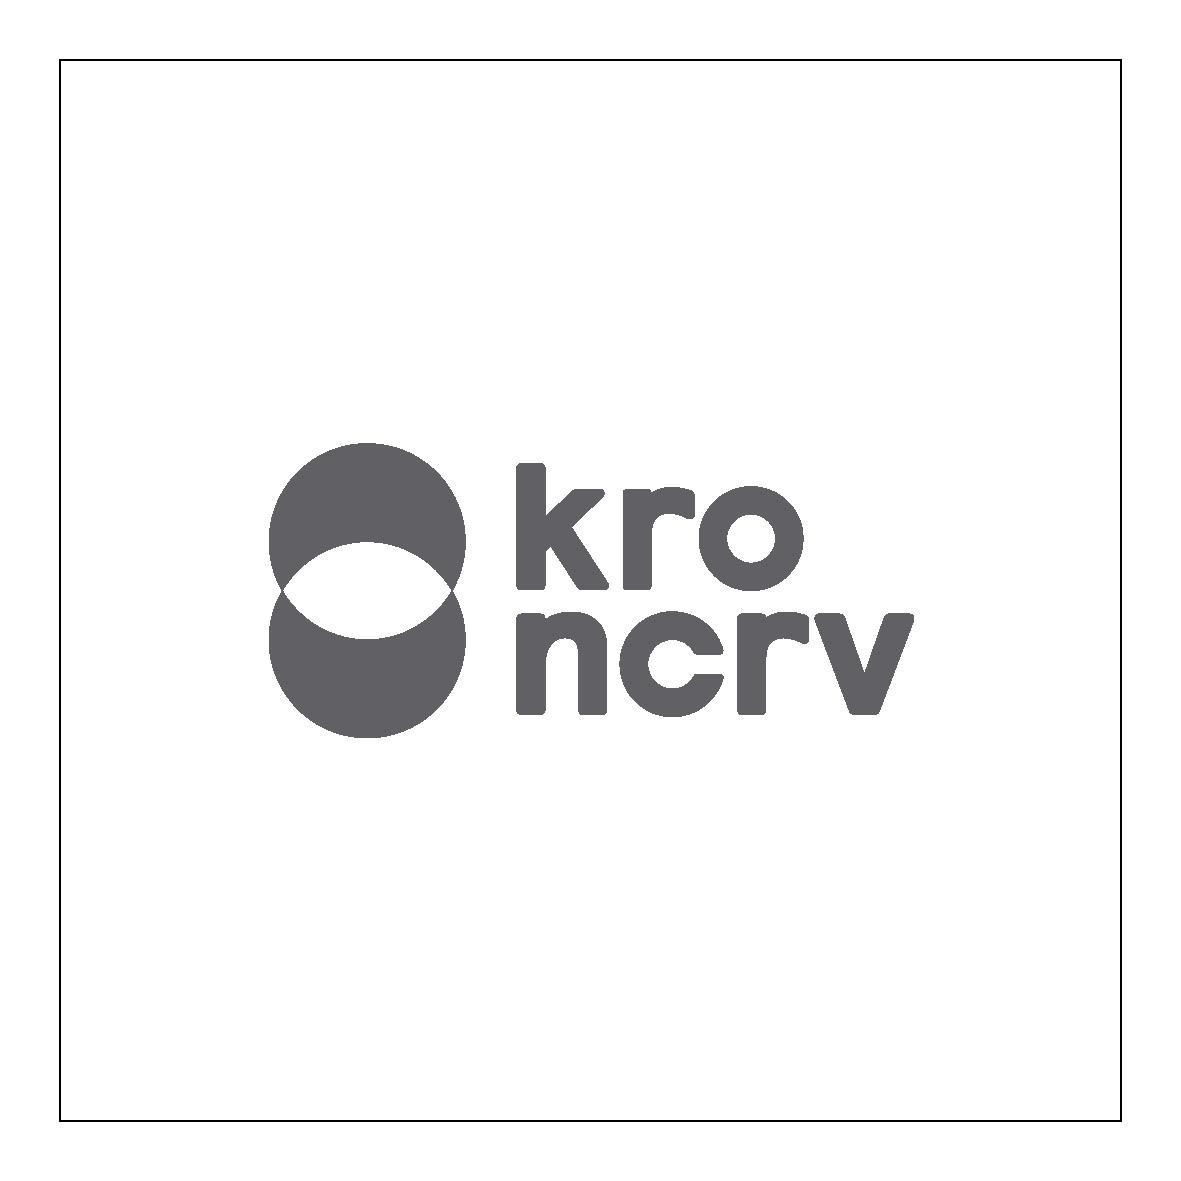 Logos_Klanten4.jpg